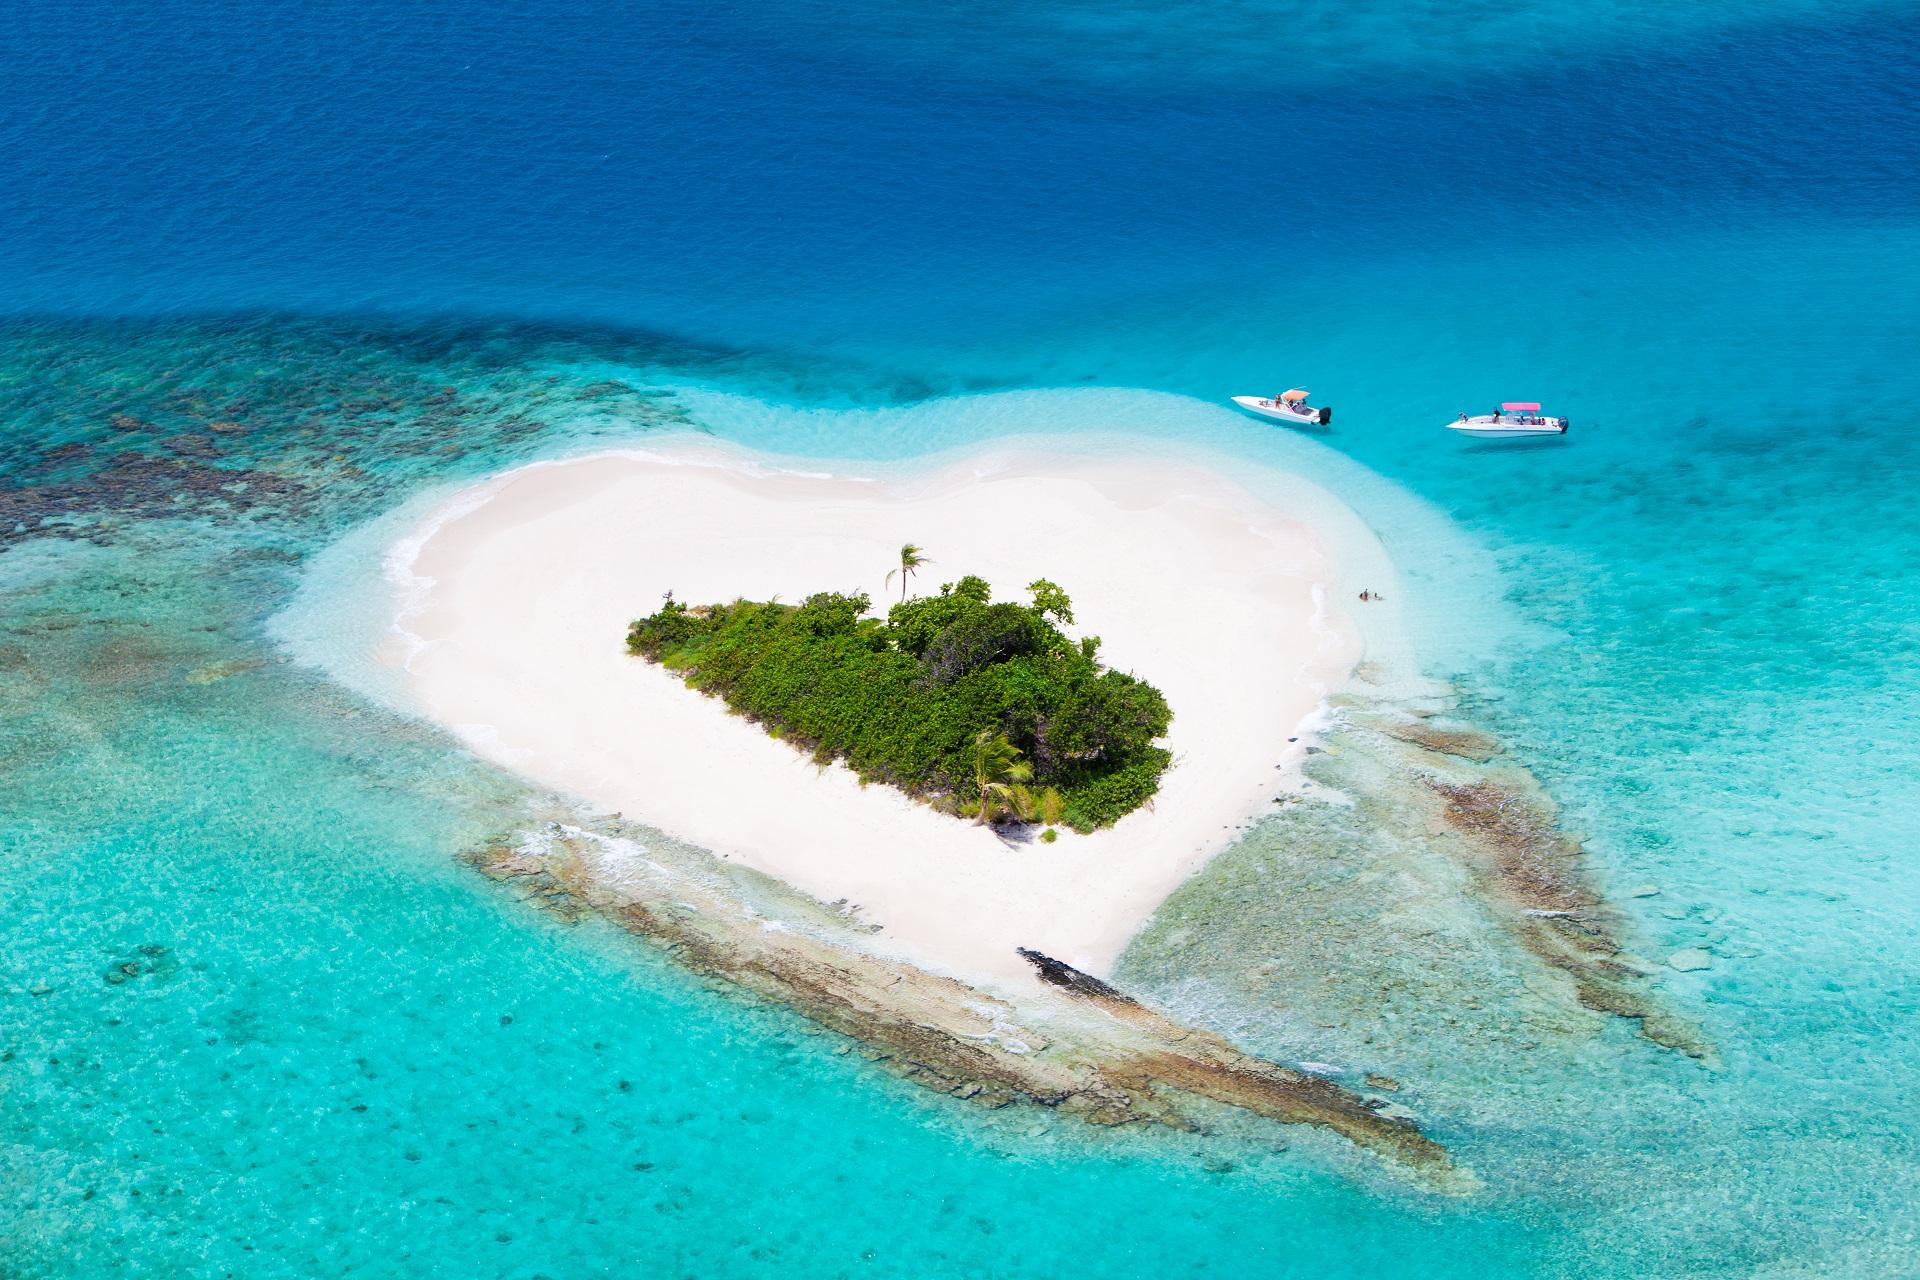 Insel Herzform